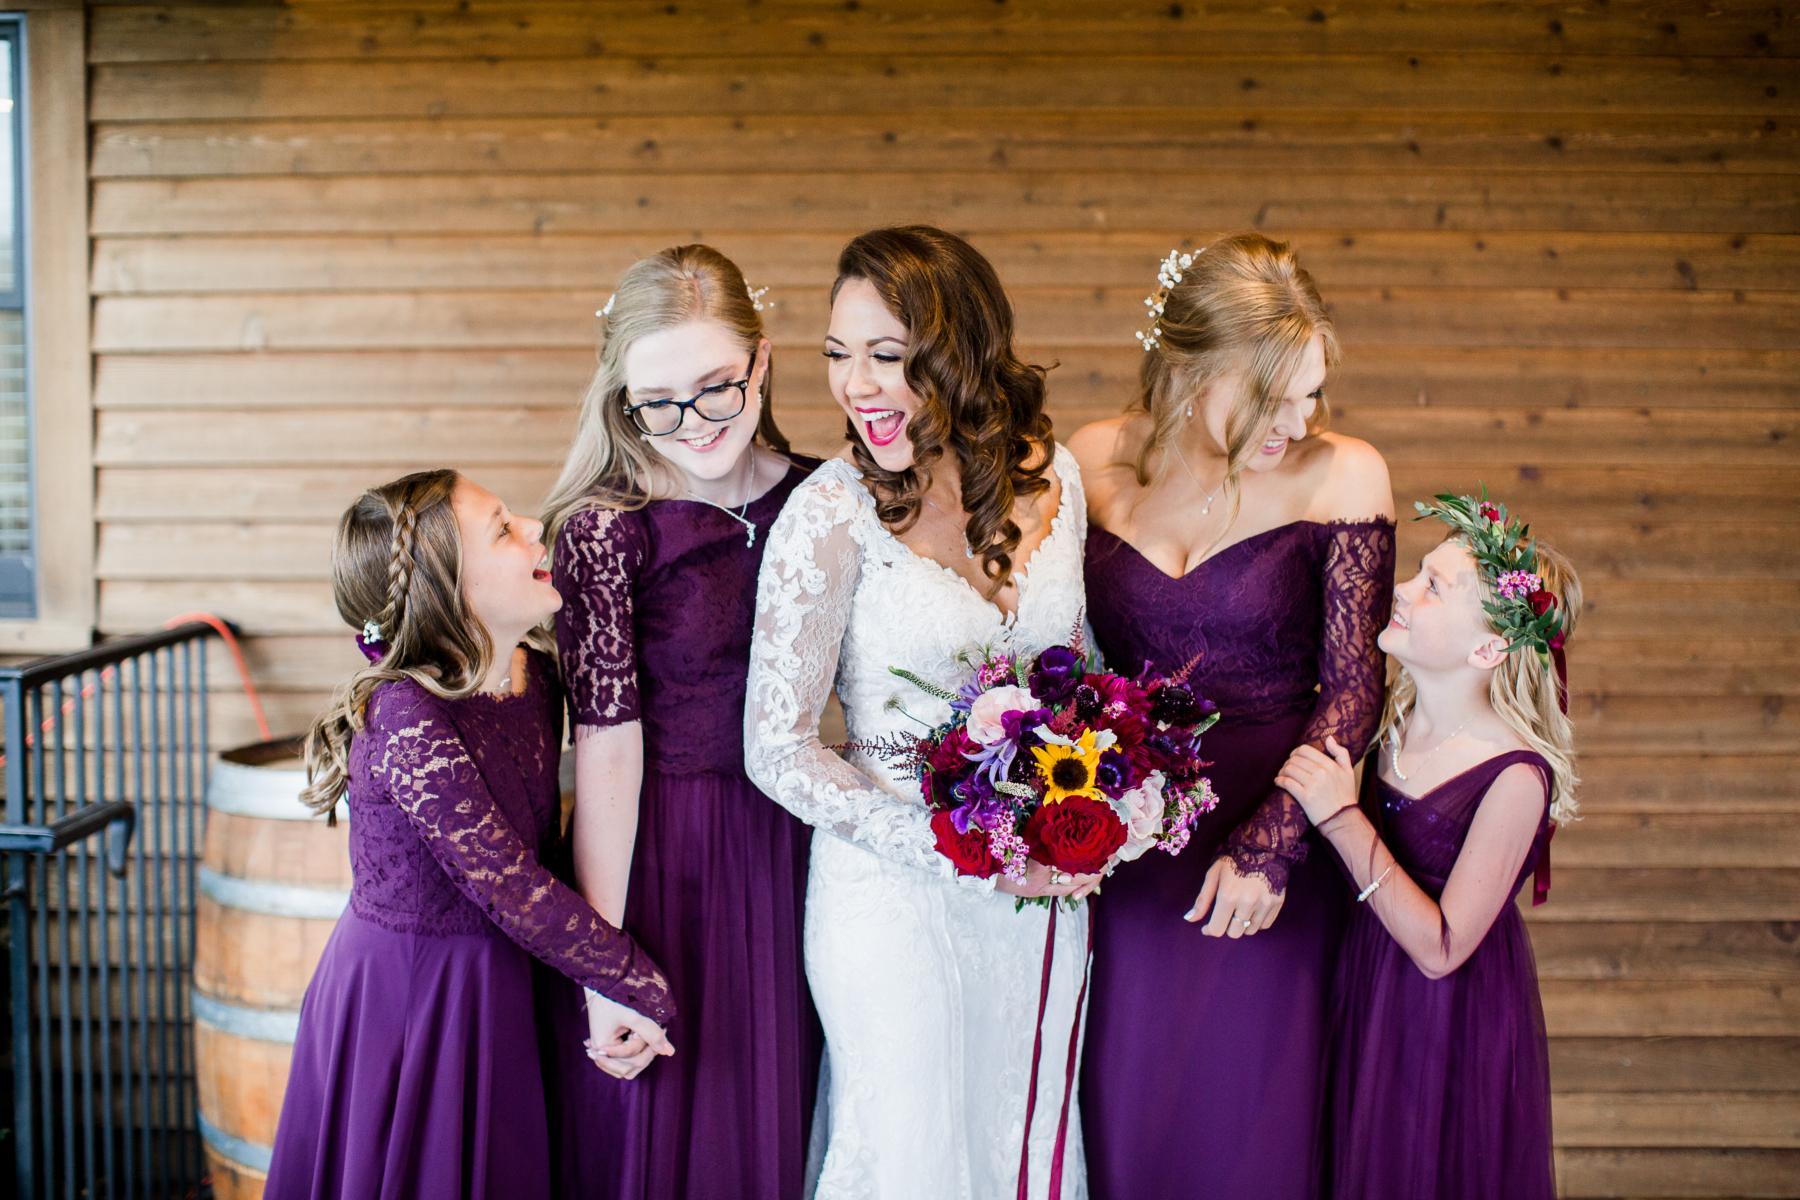 Dark purple bridesmaids dresses